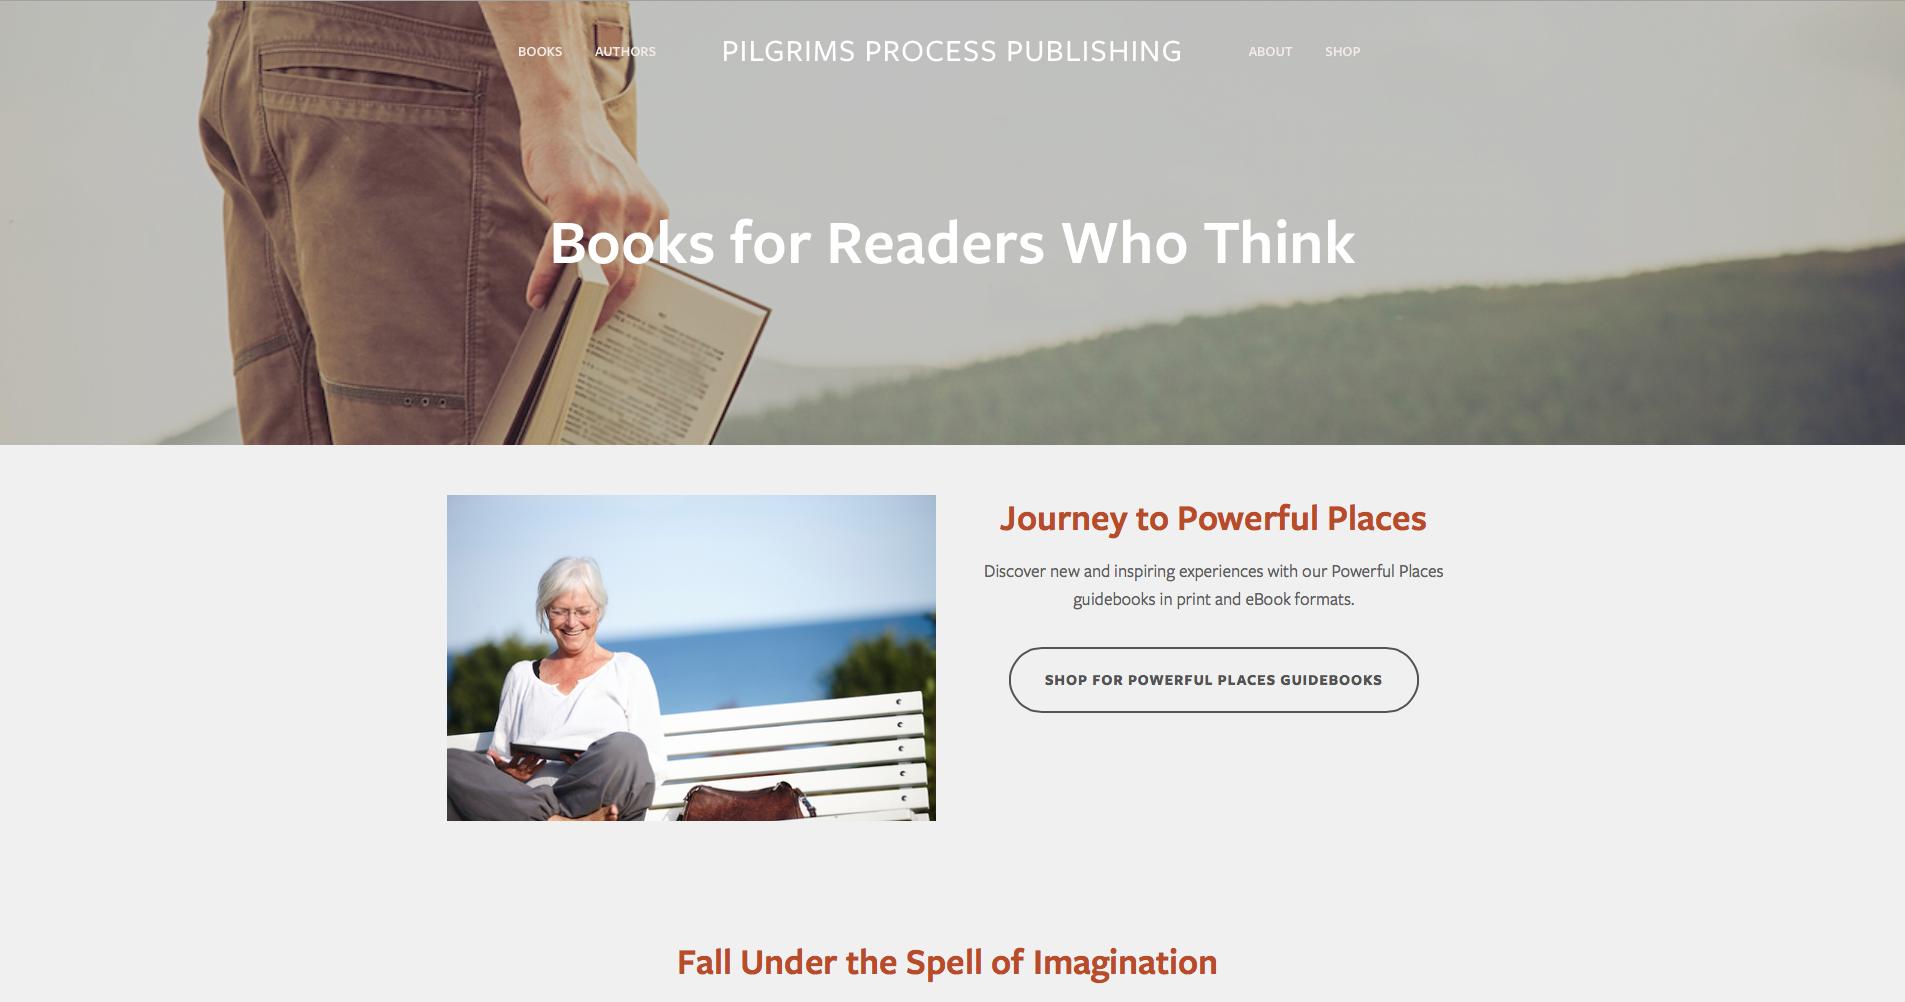 PilgrimsProcessPublishing.com